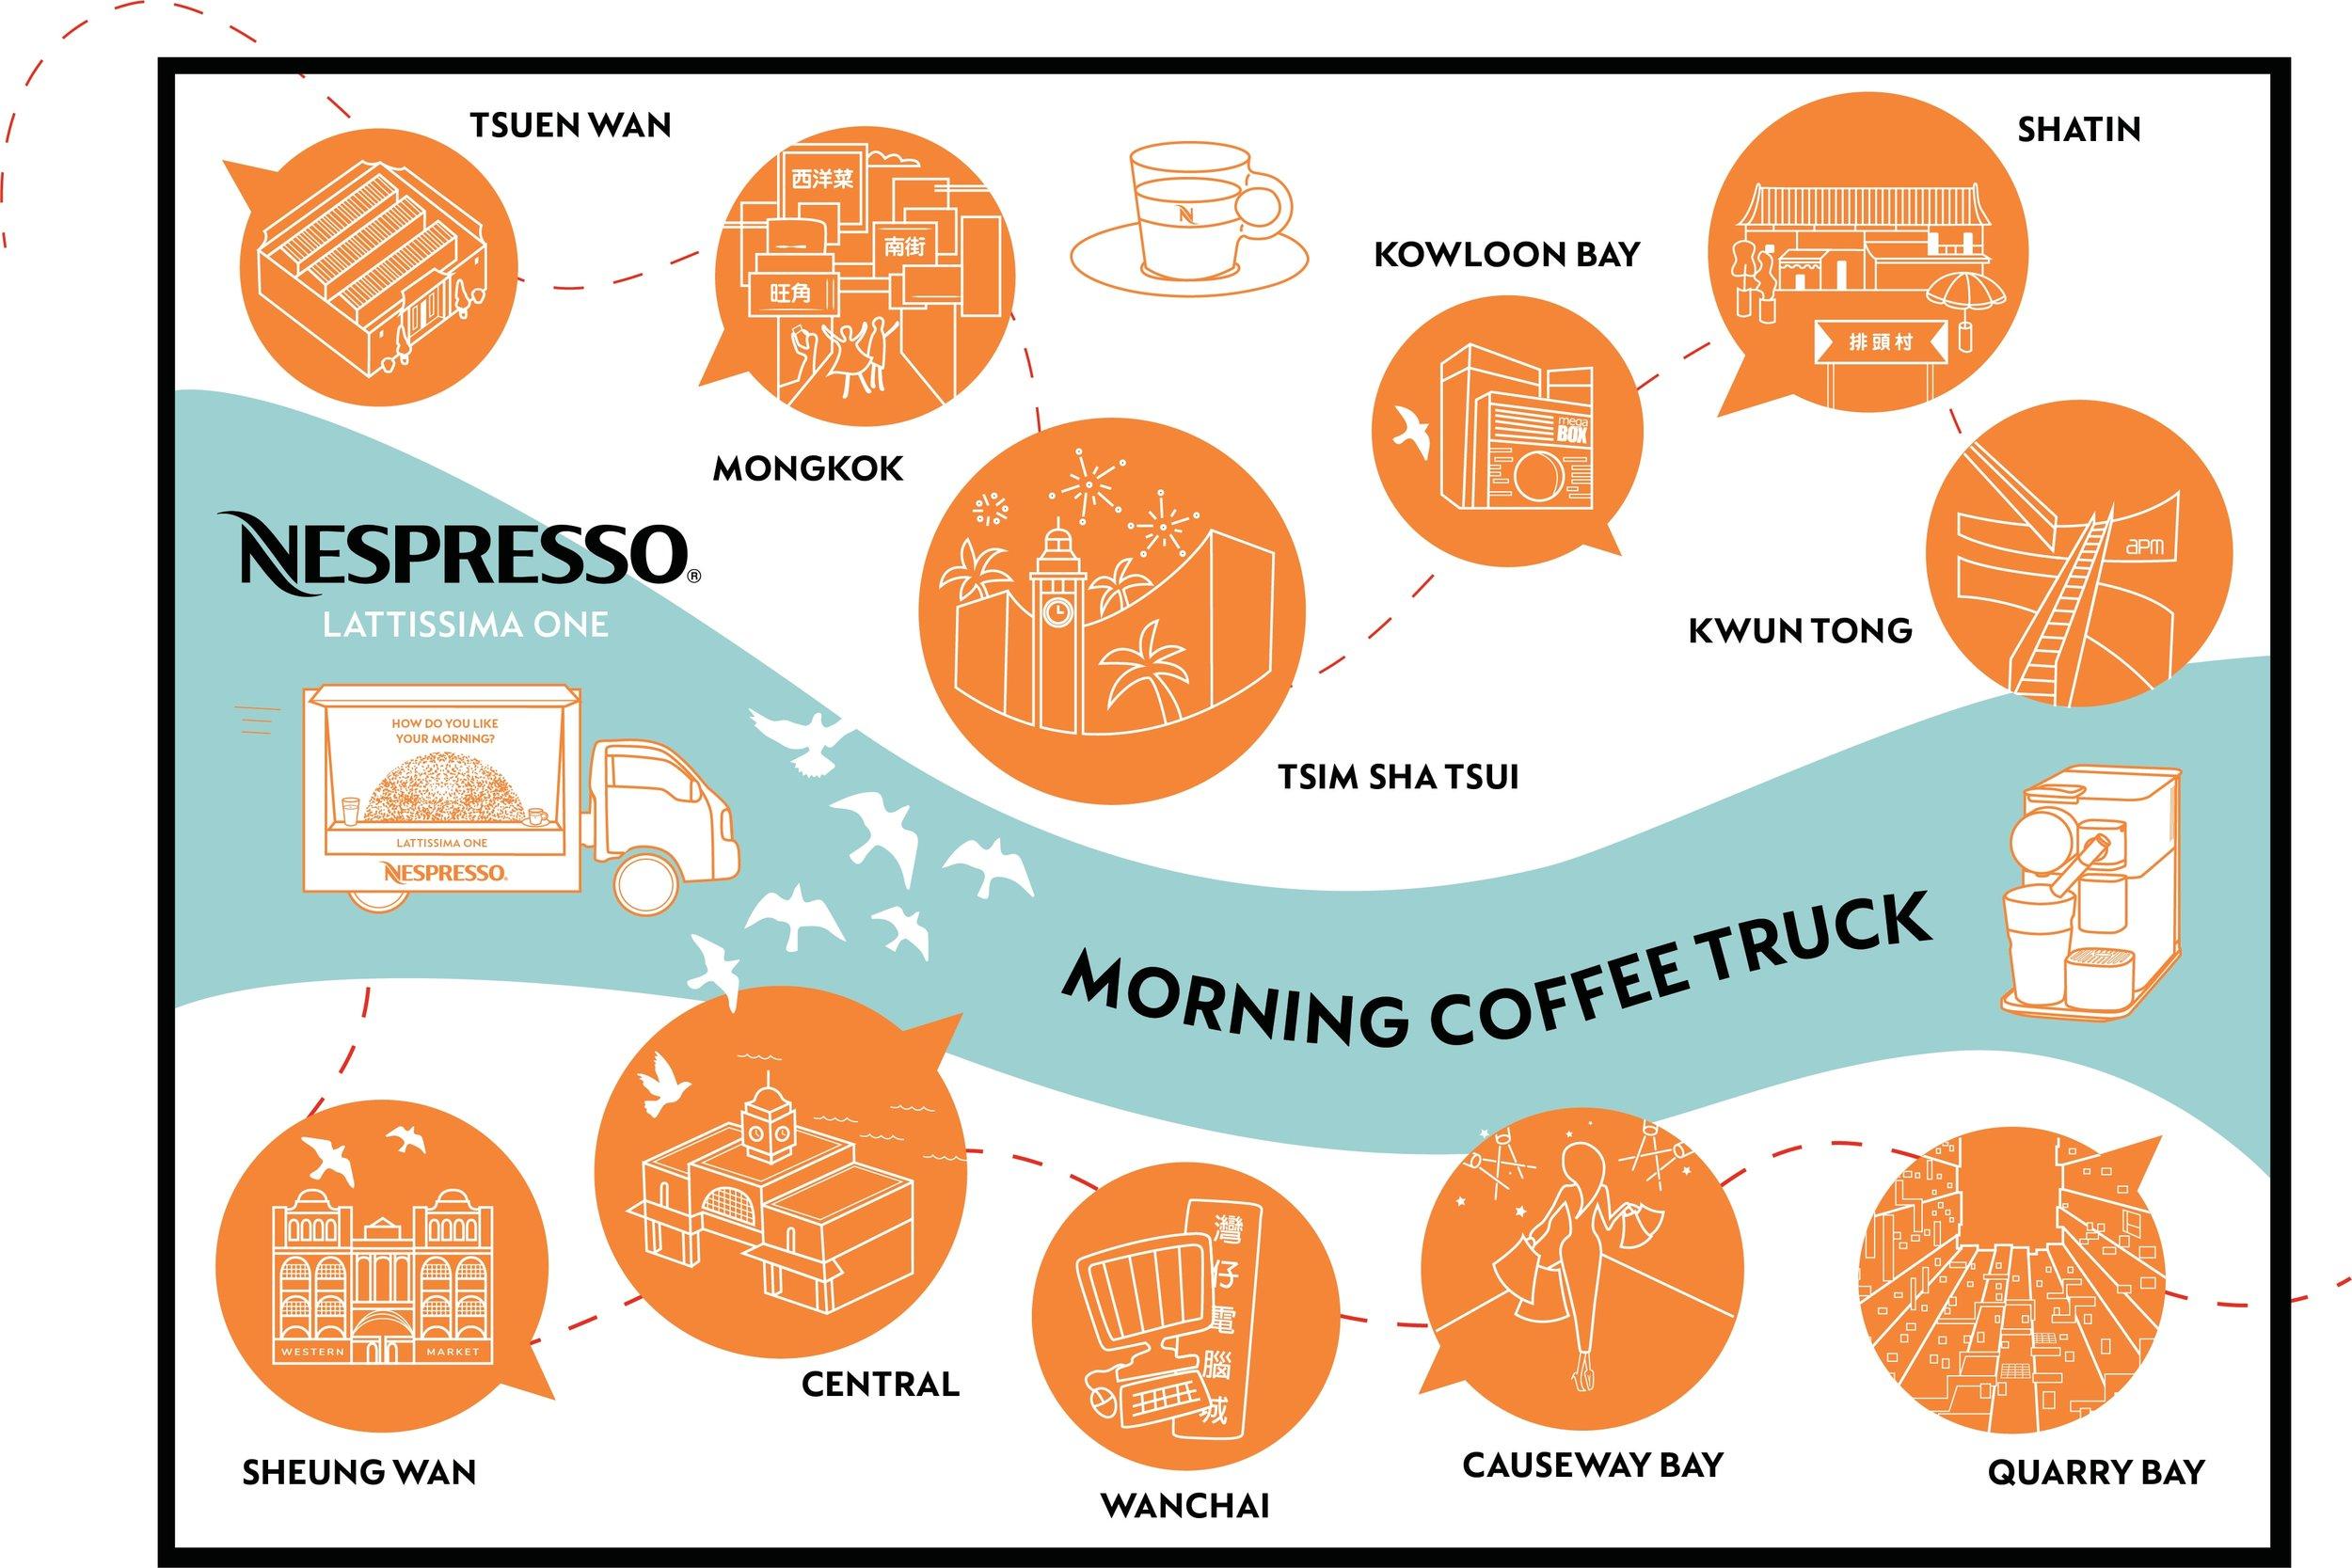 Nespresso_Map_final.jpg